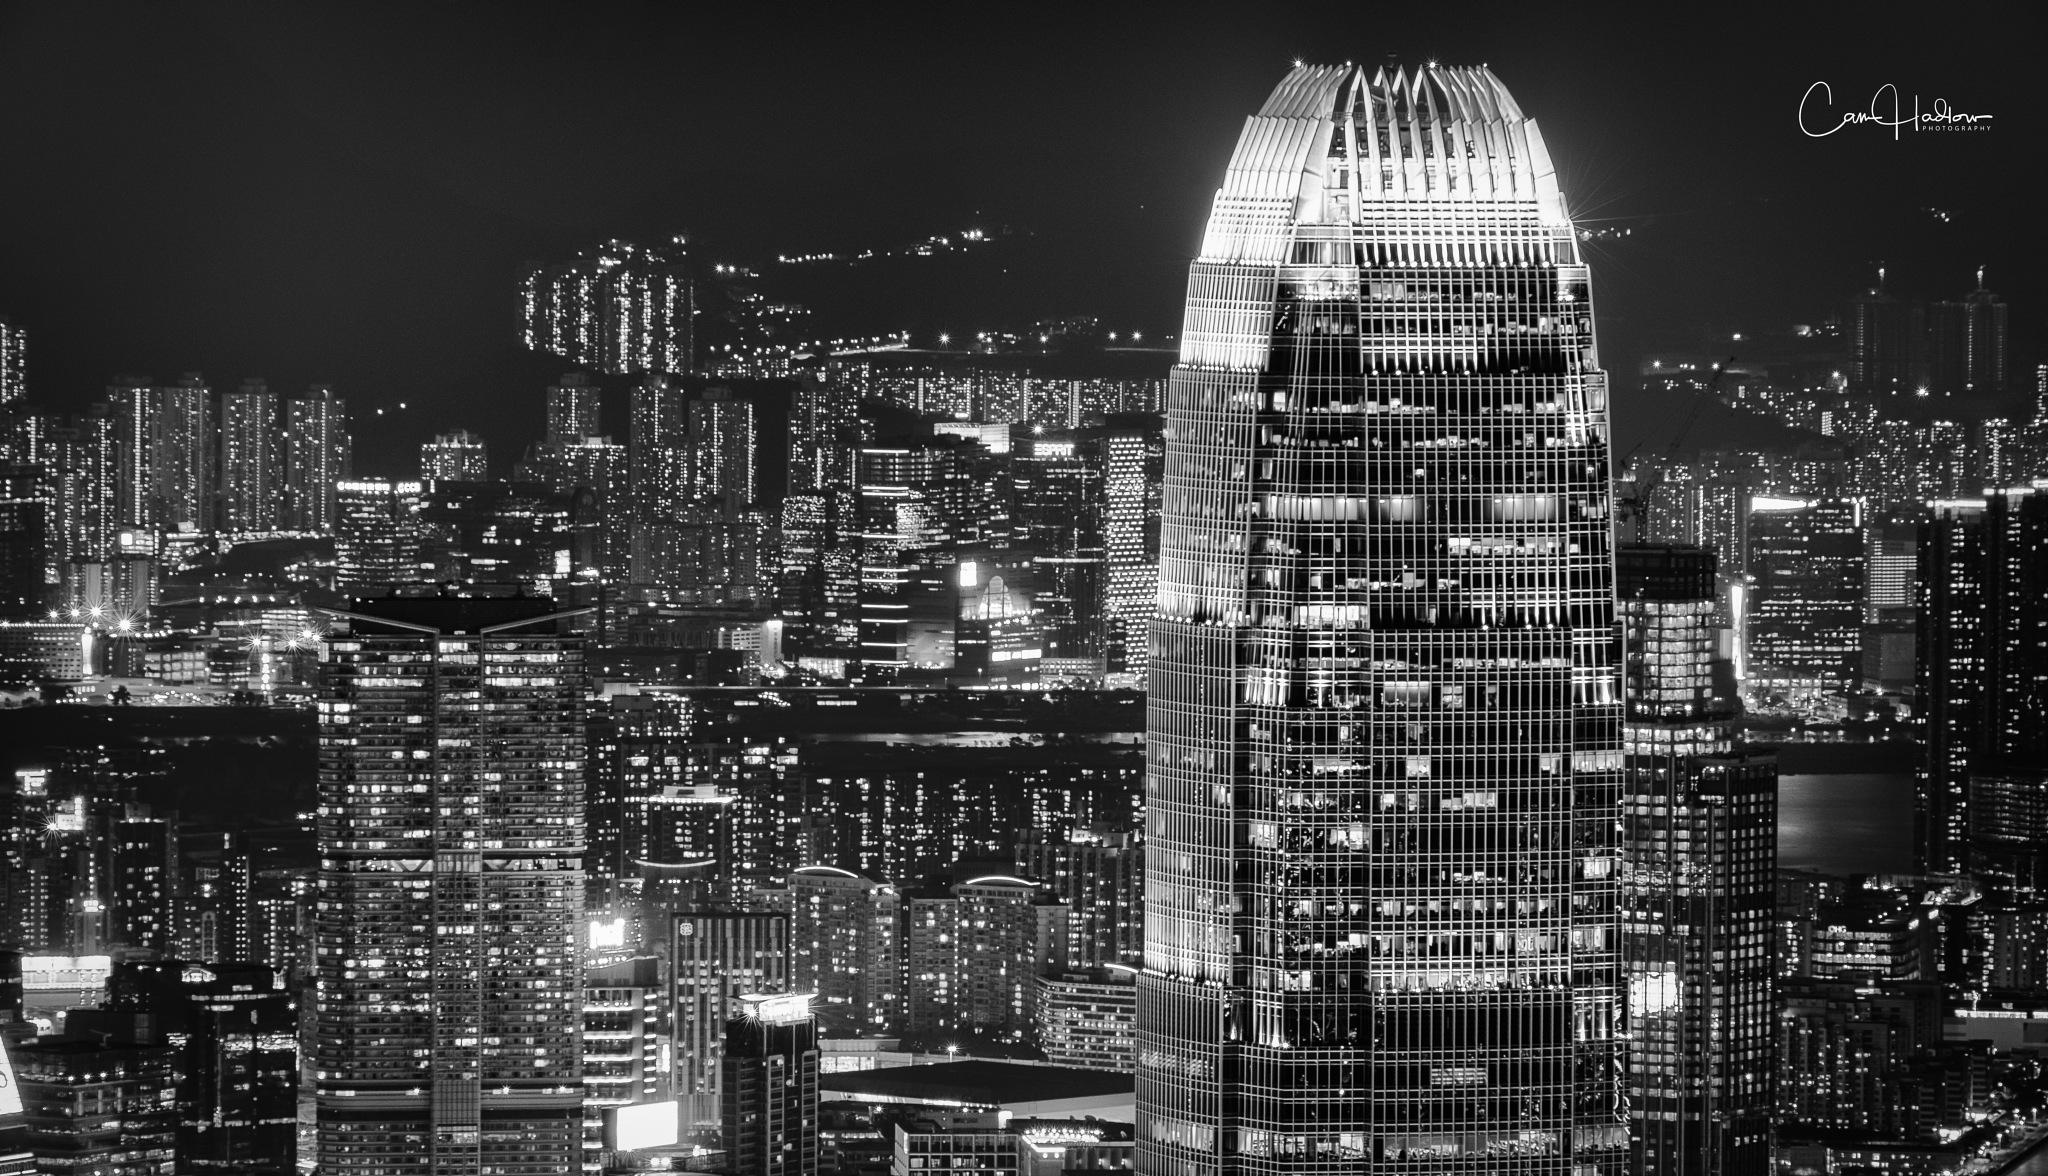 IFC Tower, Hong Kong by CamHadlowPhotography